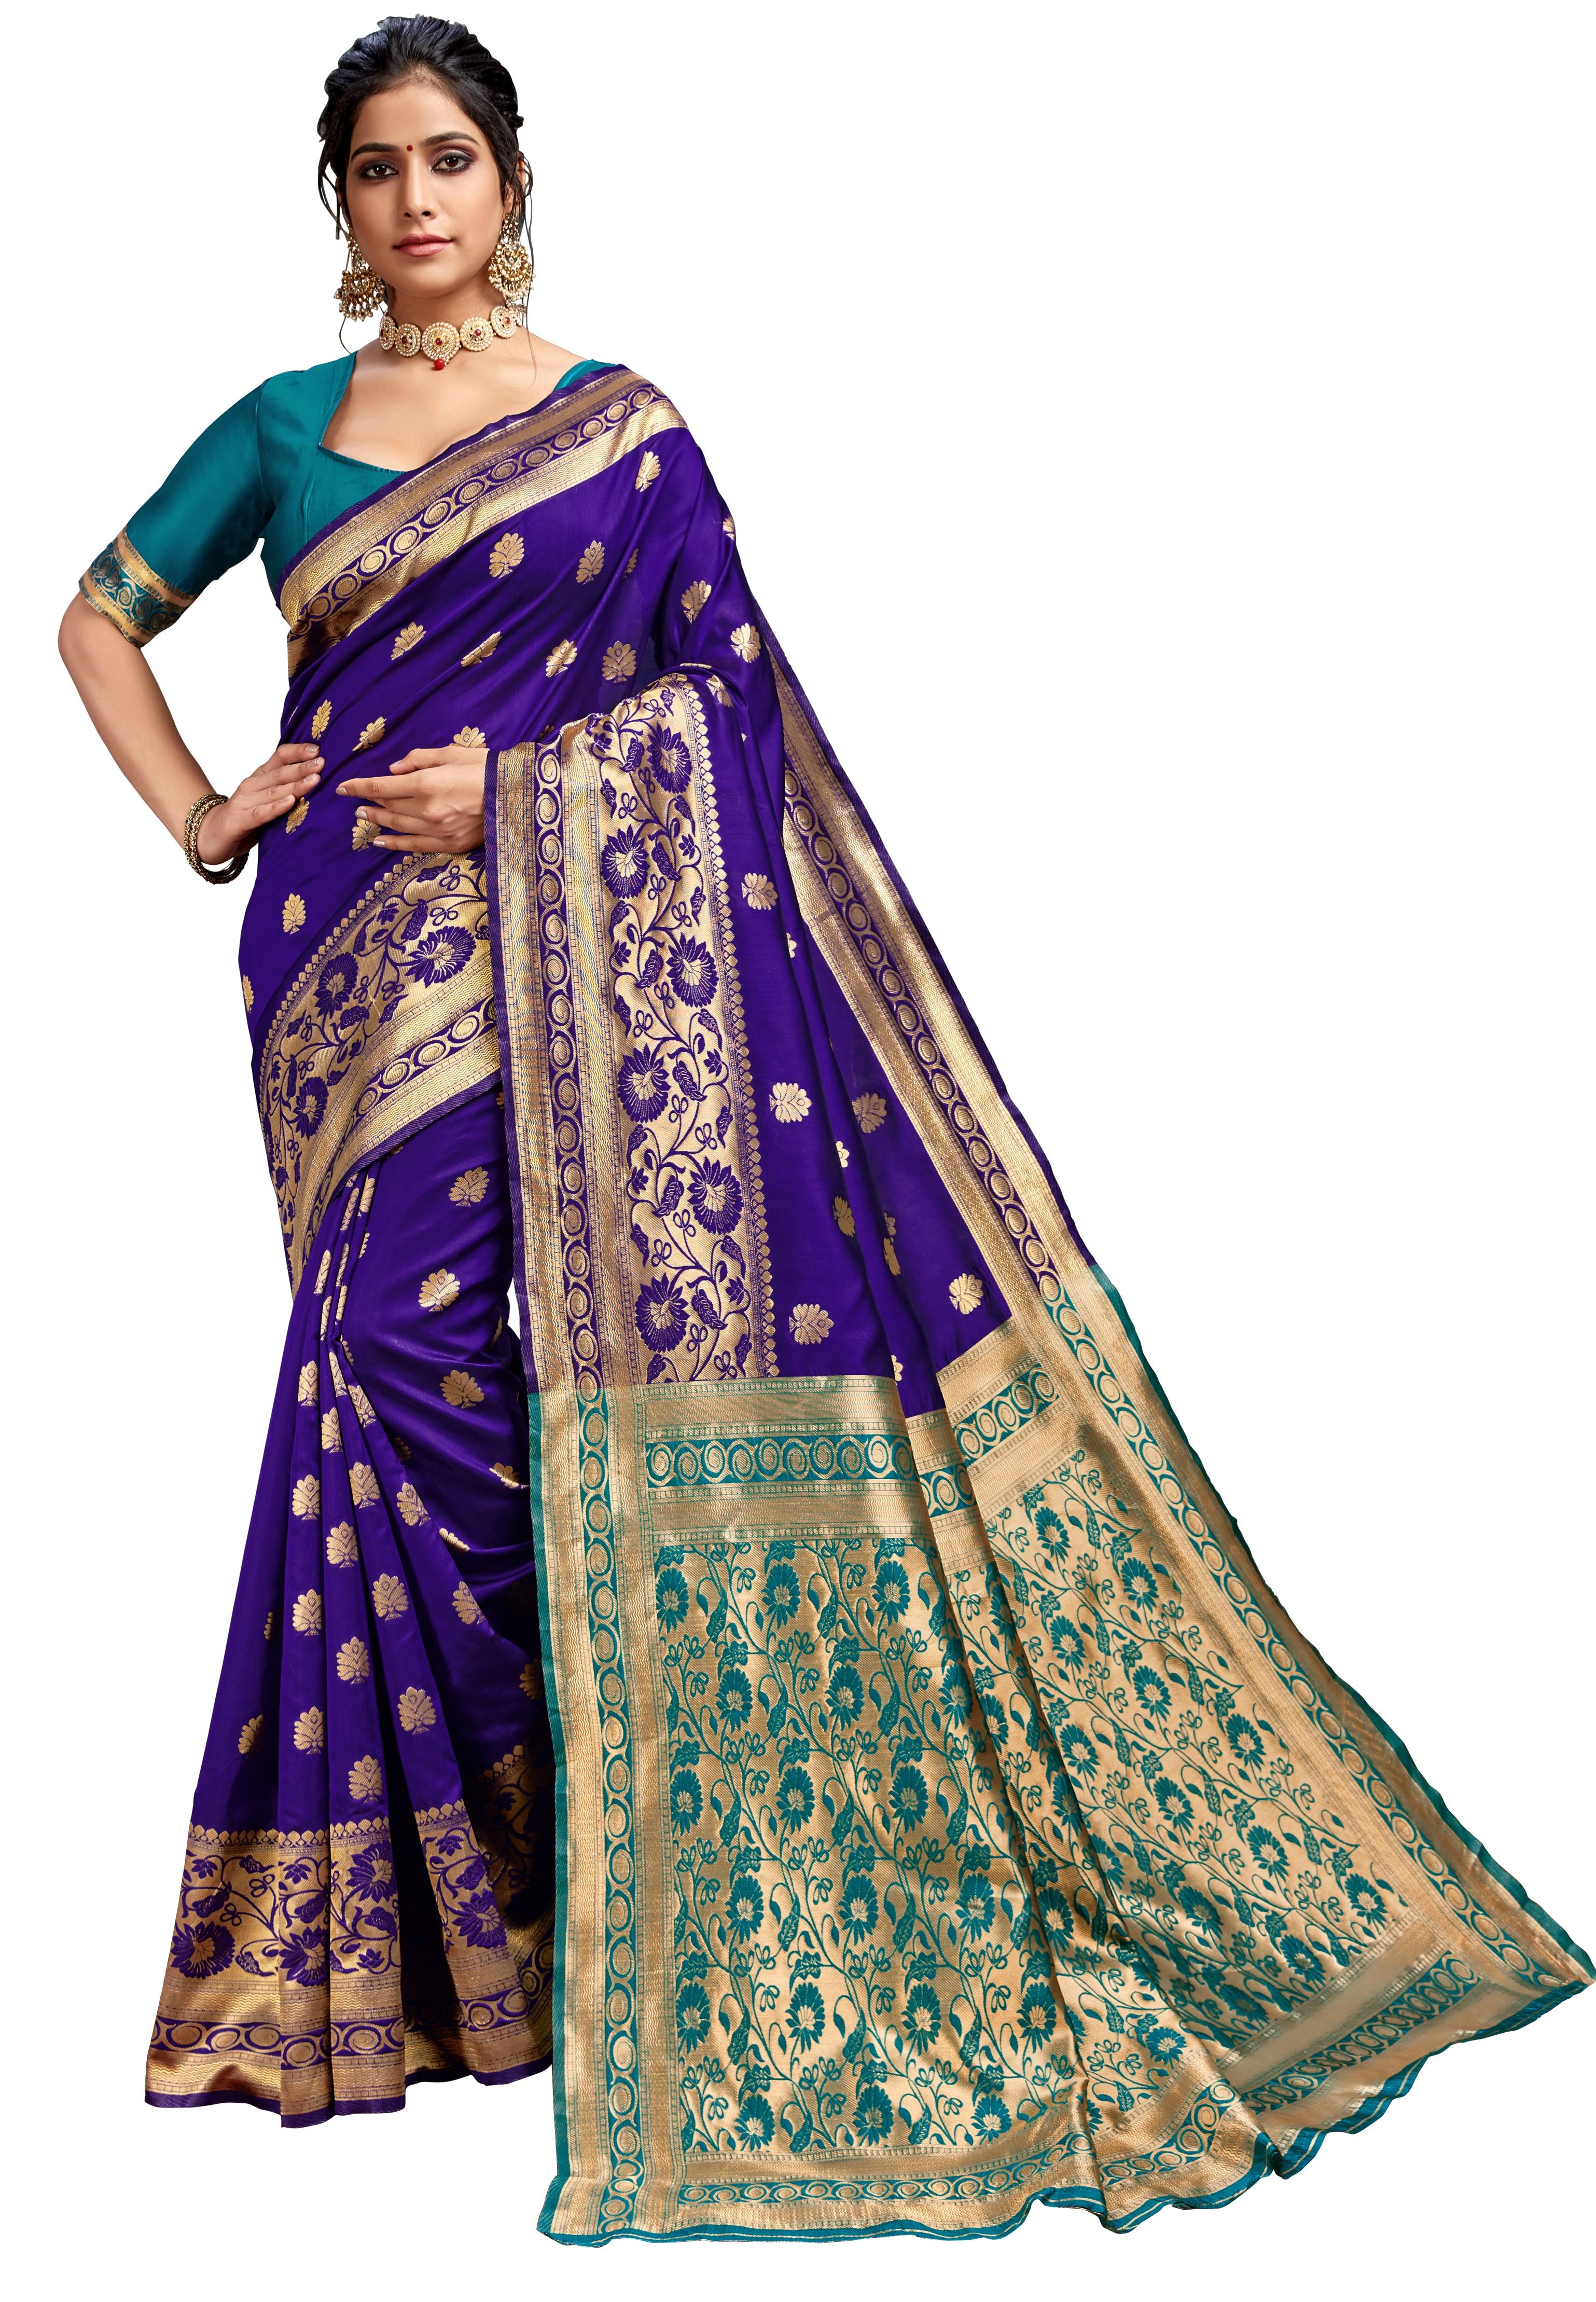 Glemora   Glemora Blue & Rama Lichi Cotton Kalpana Saree With Unstitched Blouse